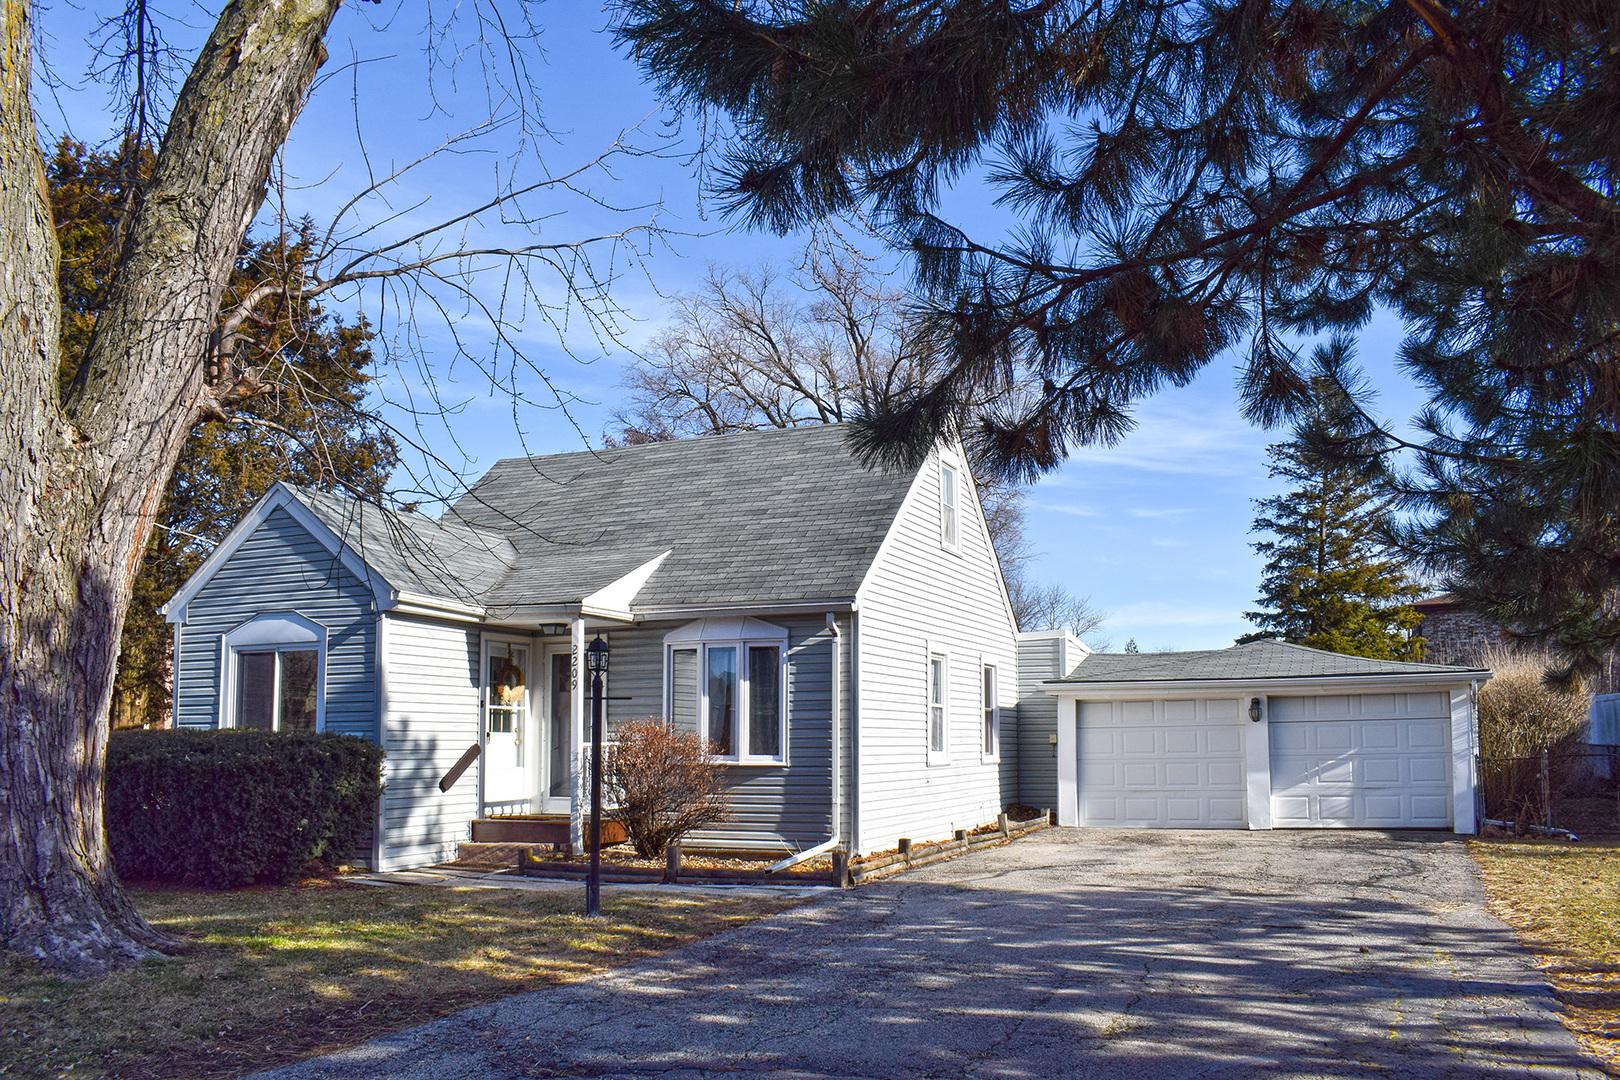 2209 DOUGLAS Avenue, Des Plaines in Cook County, IL 60018 Home for Sale